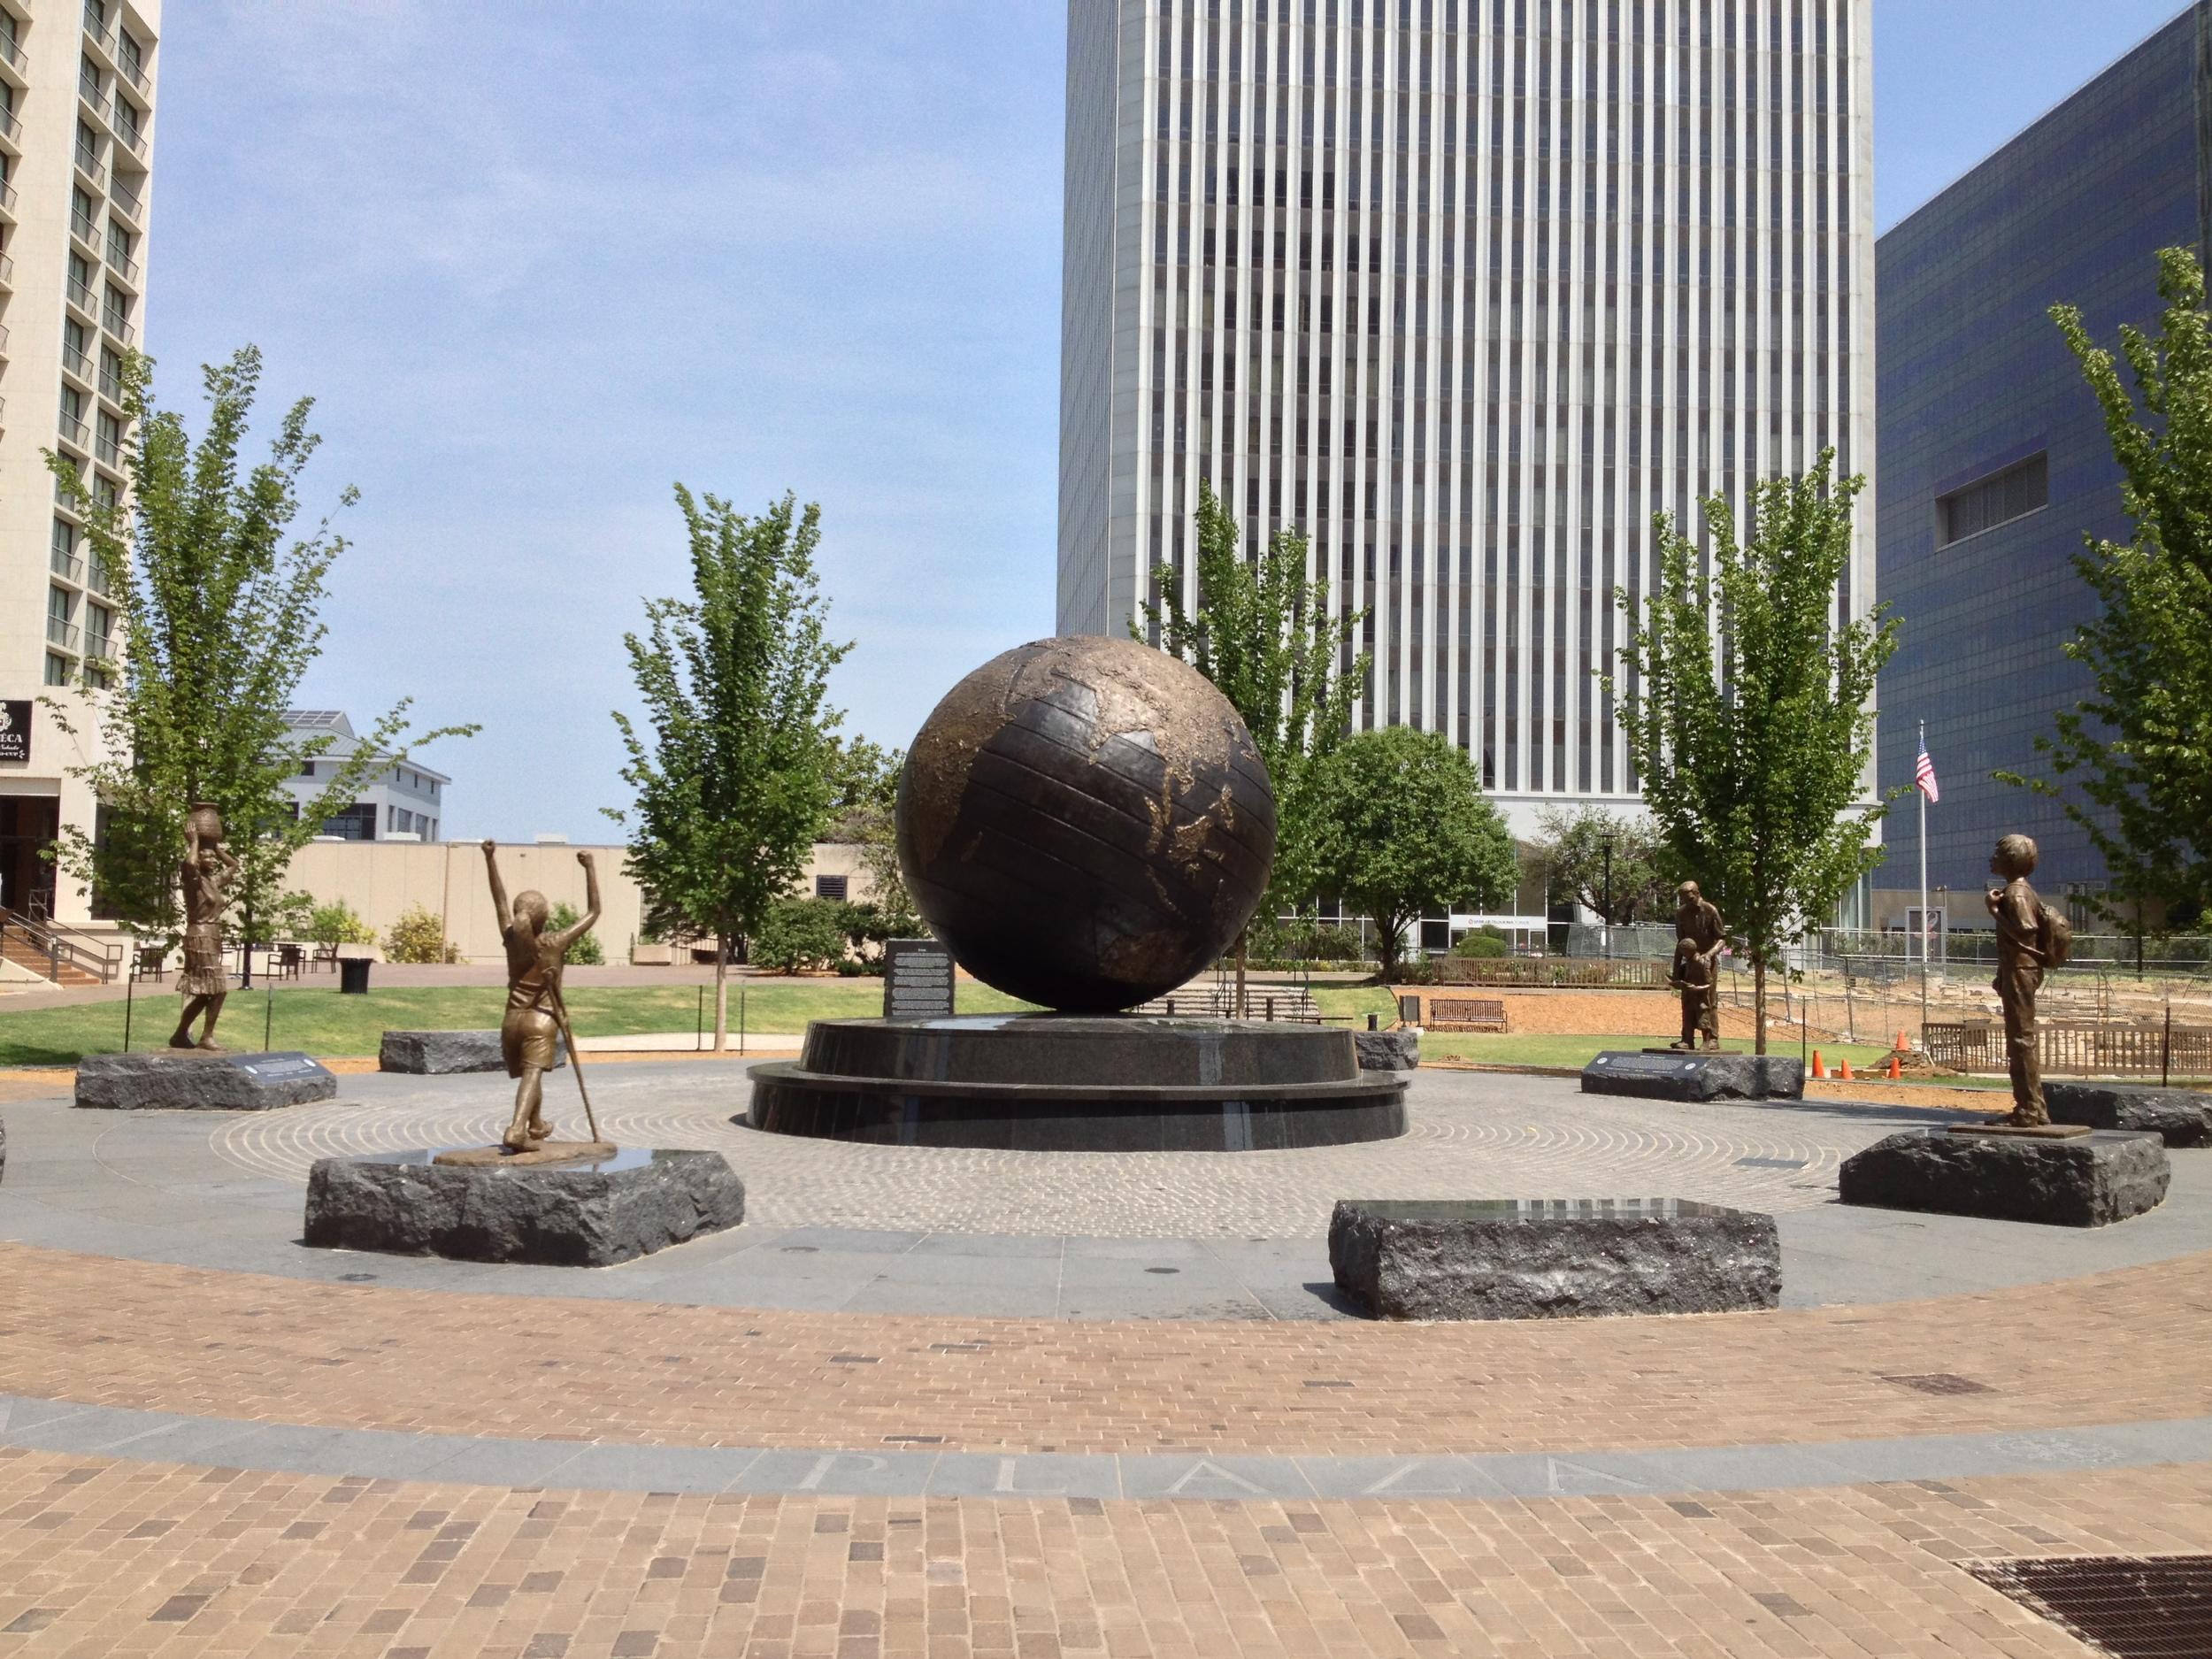 Downtown Tulsa, Oklahoma